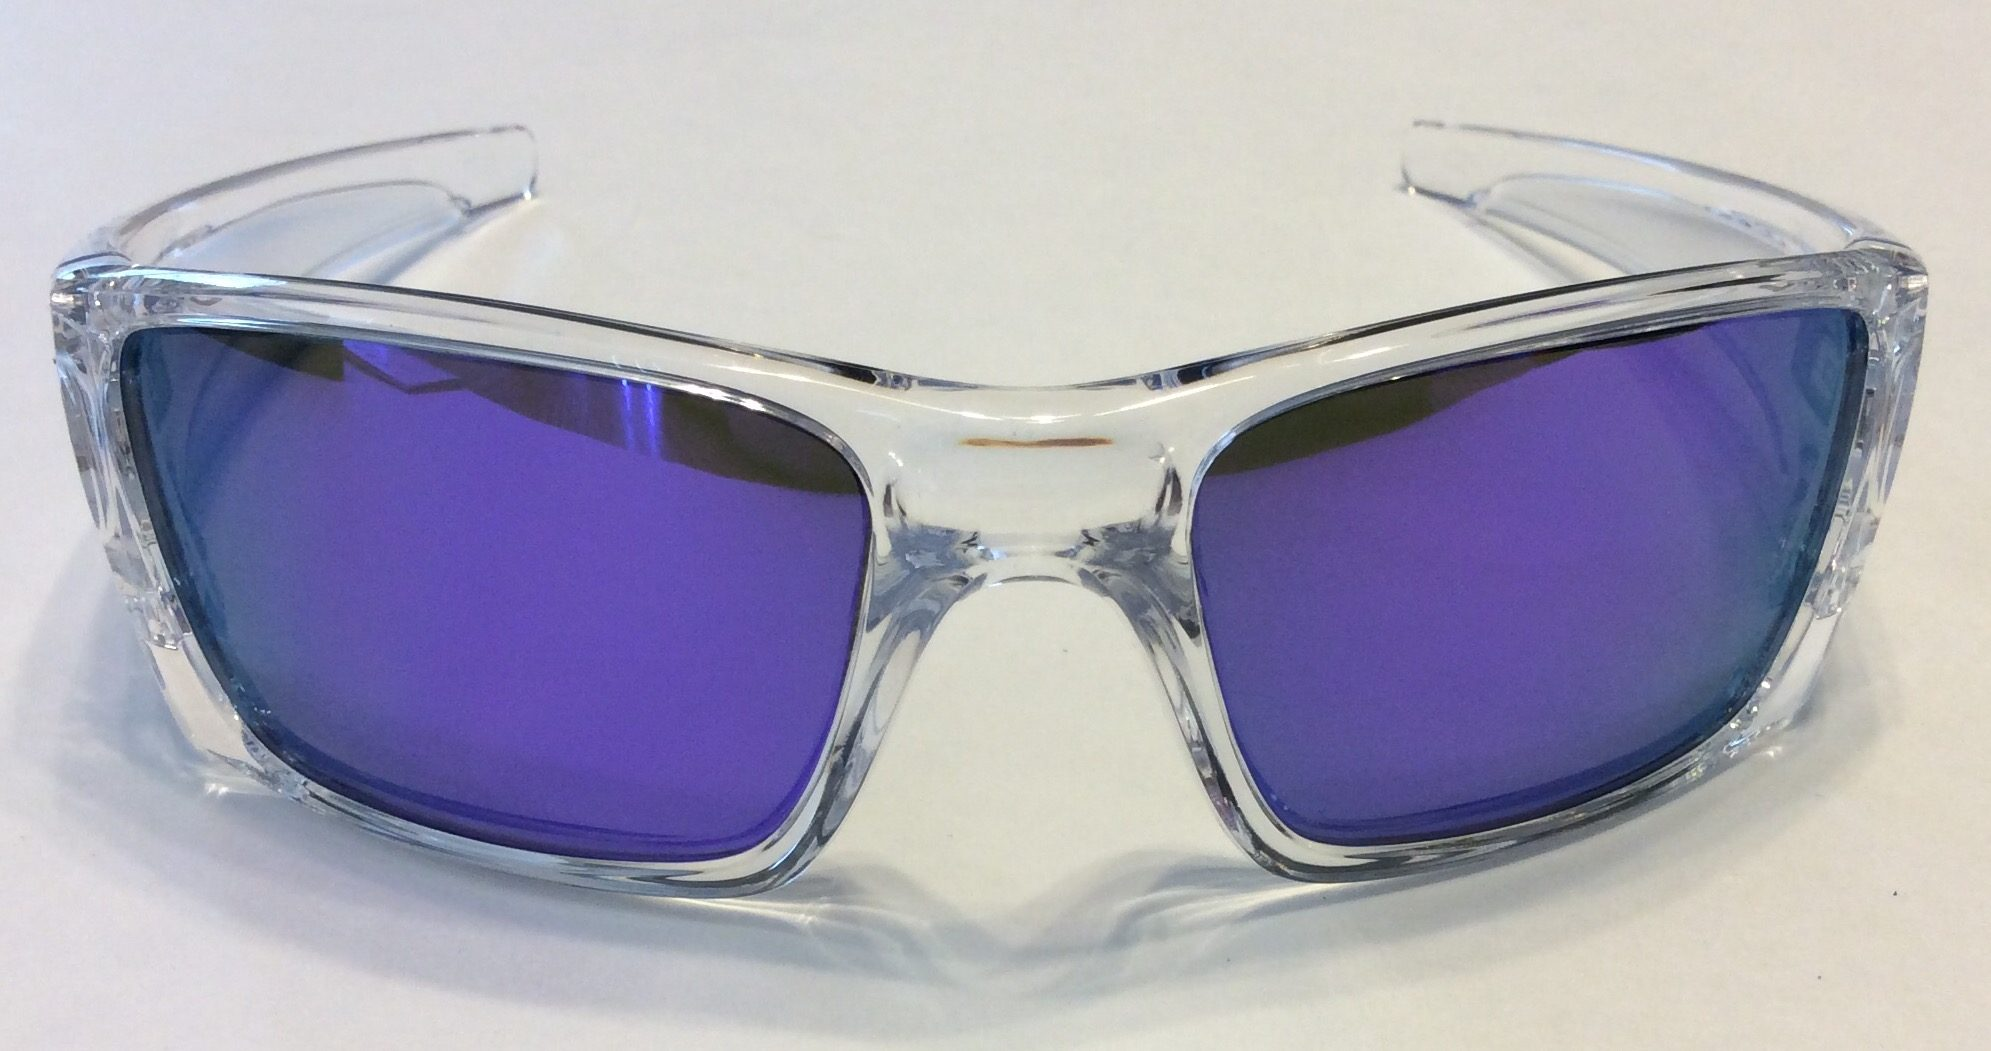 fc833ab4f5e Oakley Fuel Cell Sunglasses - Polished Clear - Violet Iridium - OO9096-04